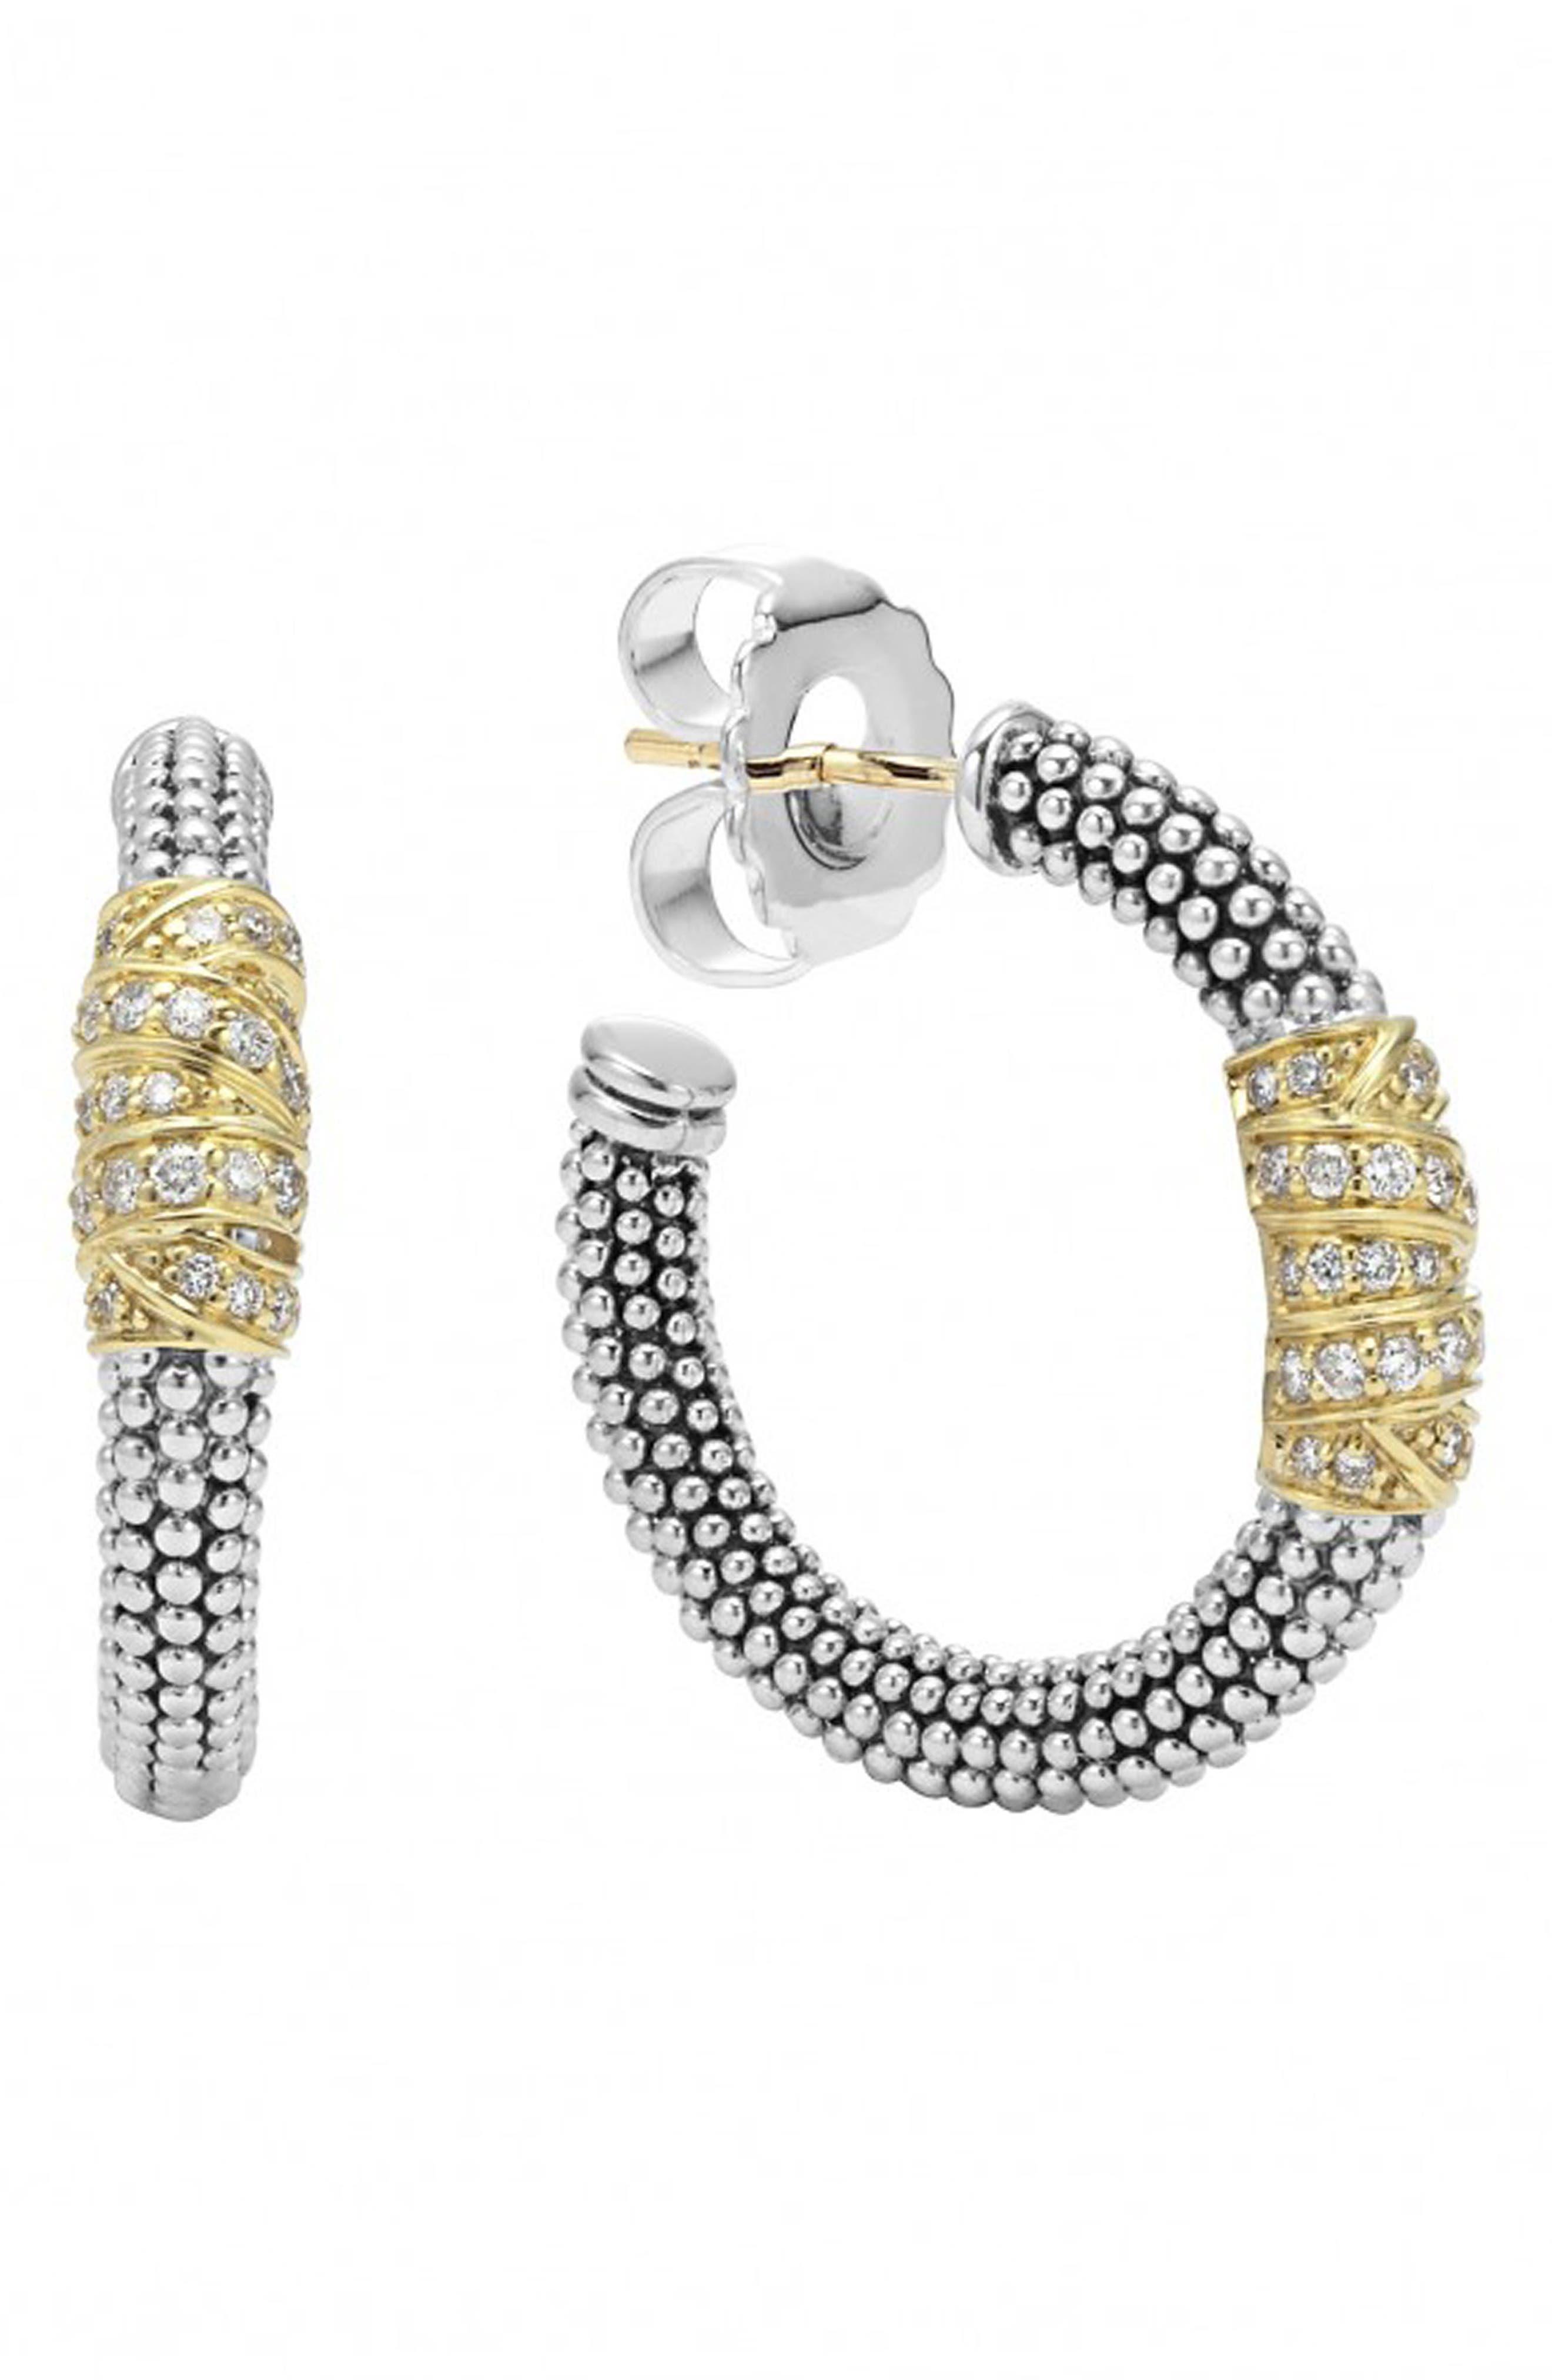 LAGOS 'Embrace' Caviar Diamond Hoop Earrings